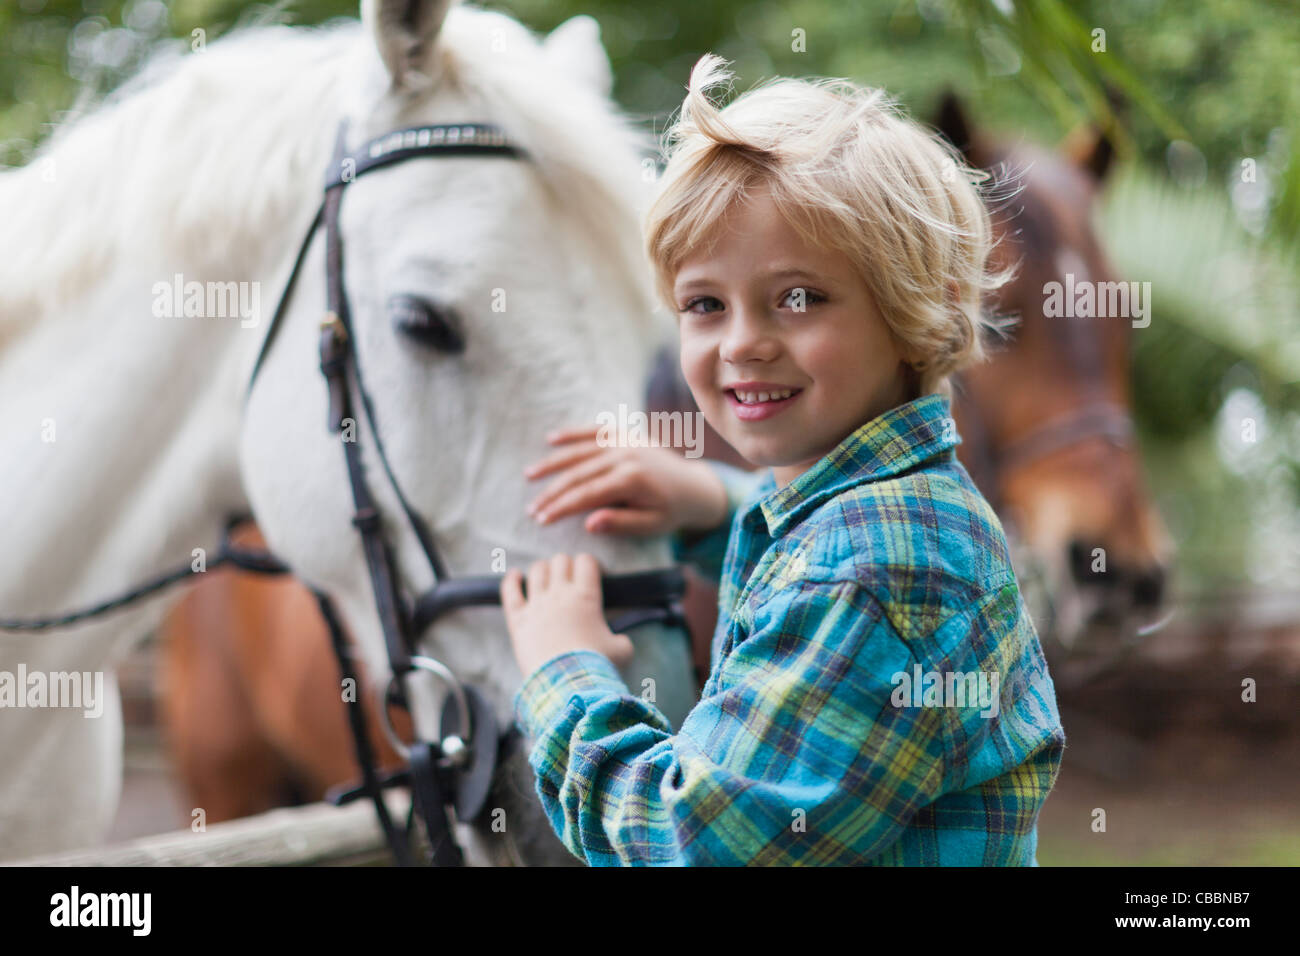 Smiling boy petting horse in yard - Stock Image